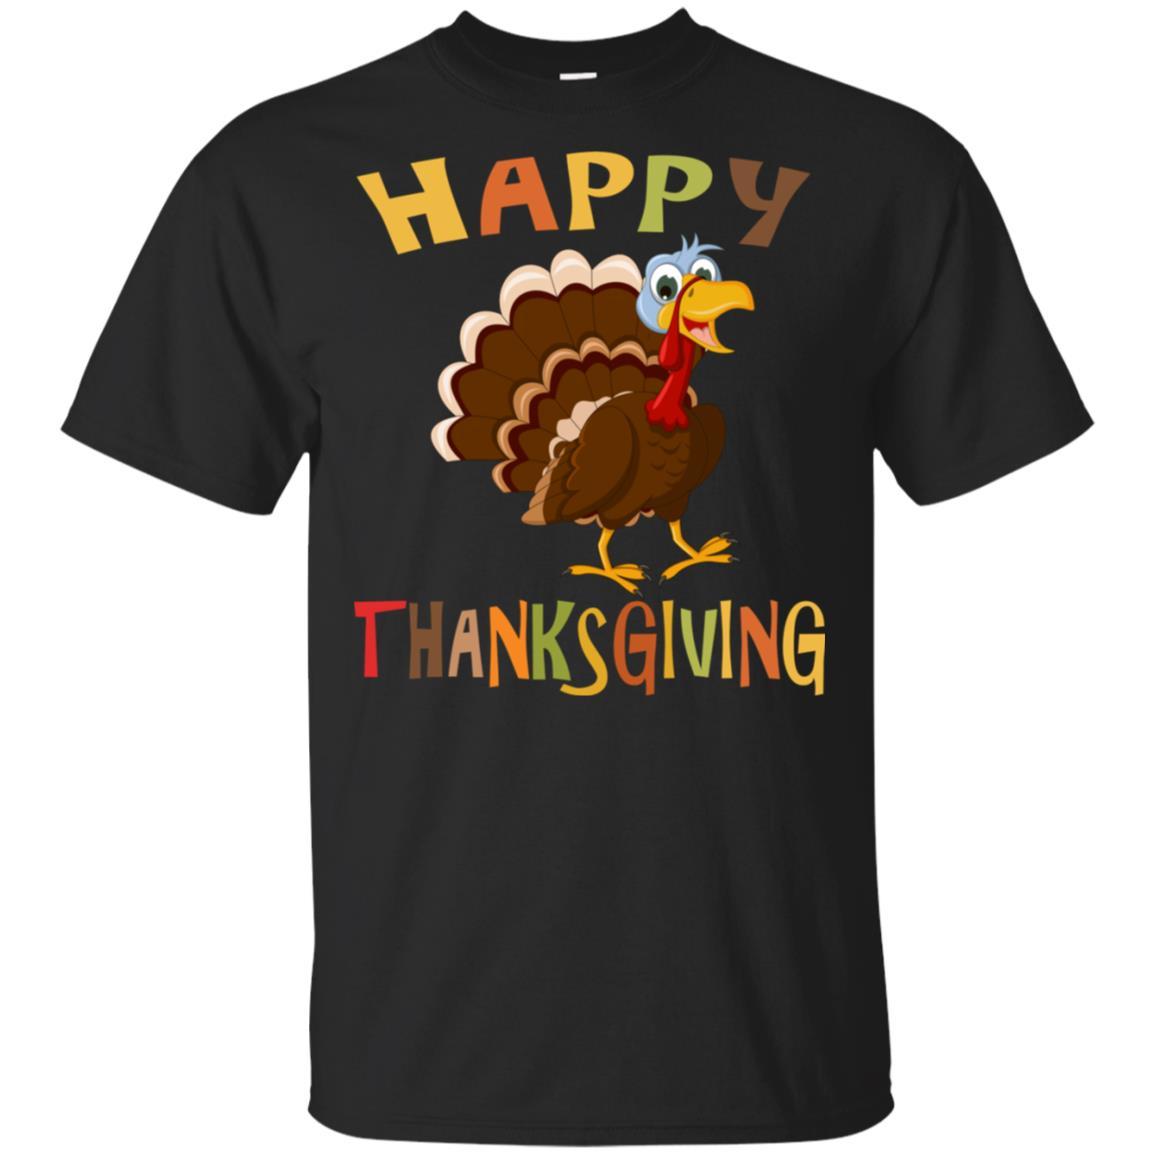 Happy Thanksgiving Tee Happy Thanksgiving Unisex Short Sleeve